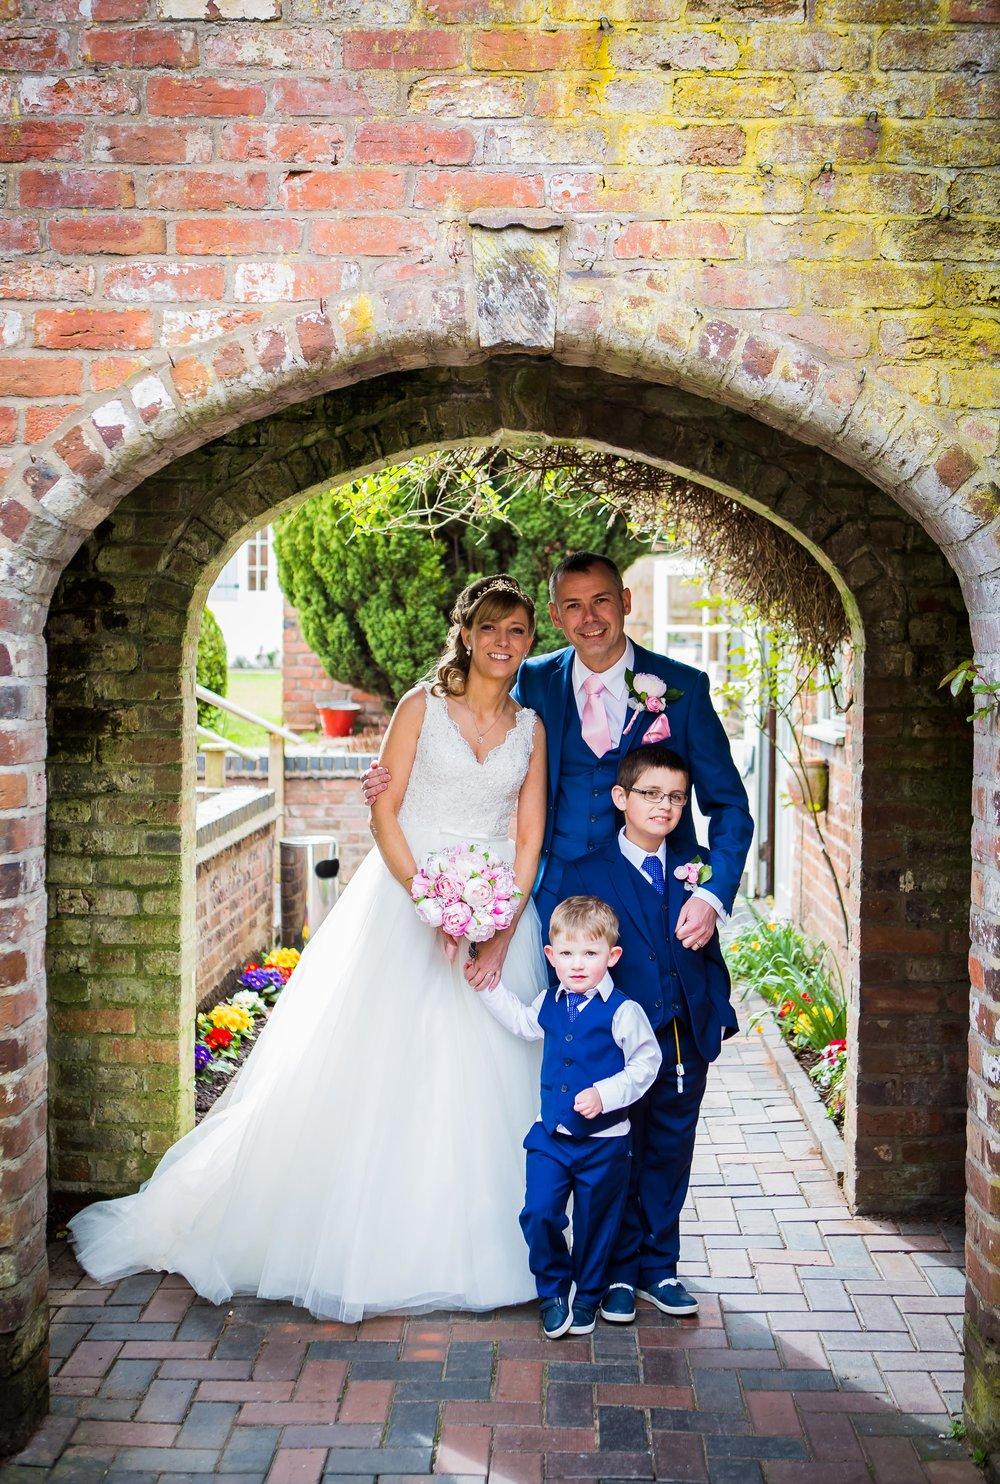 Simon & Michelle's Wedding_Helen Cotton Photography©_27.JPG